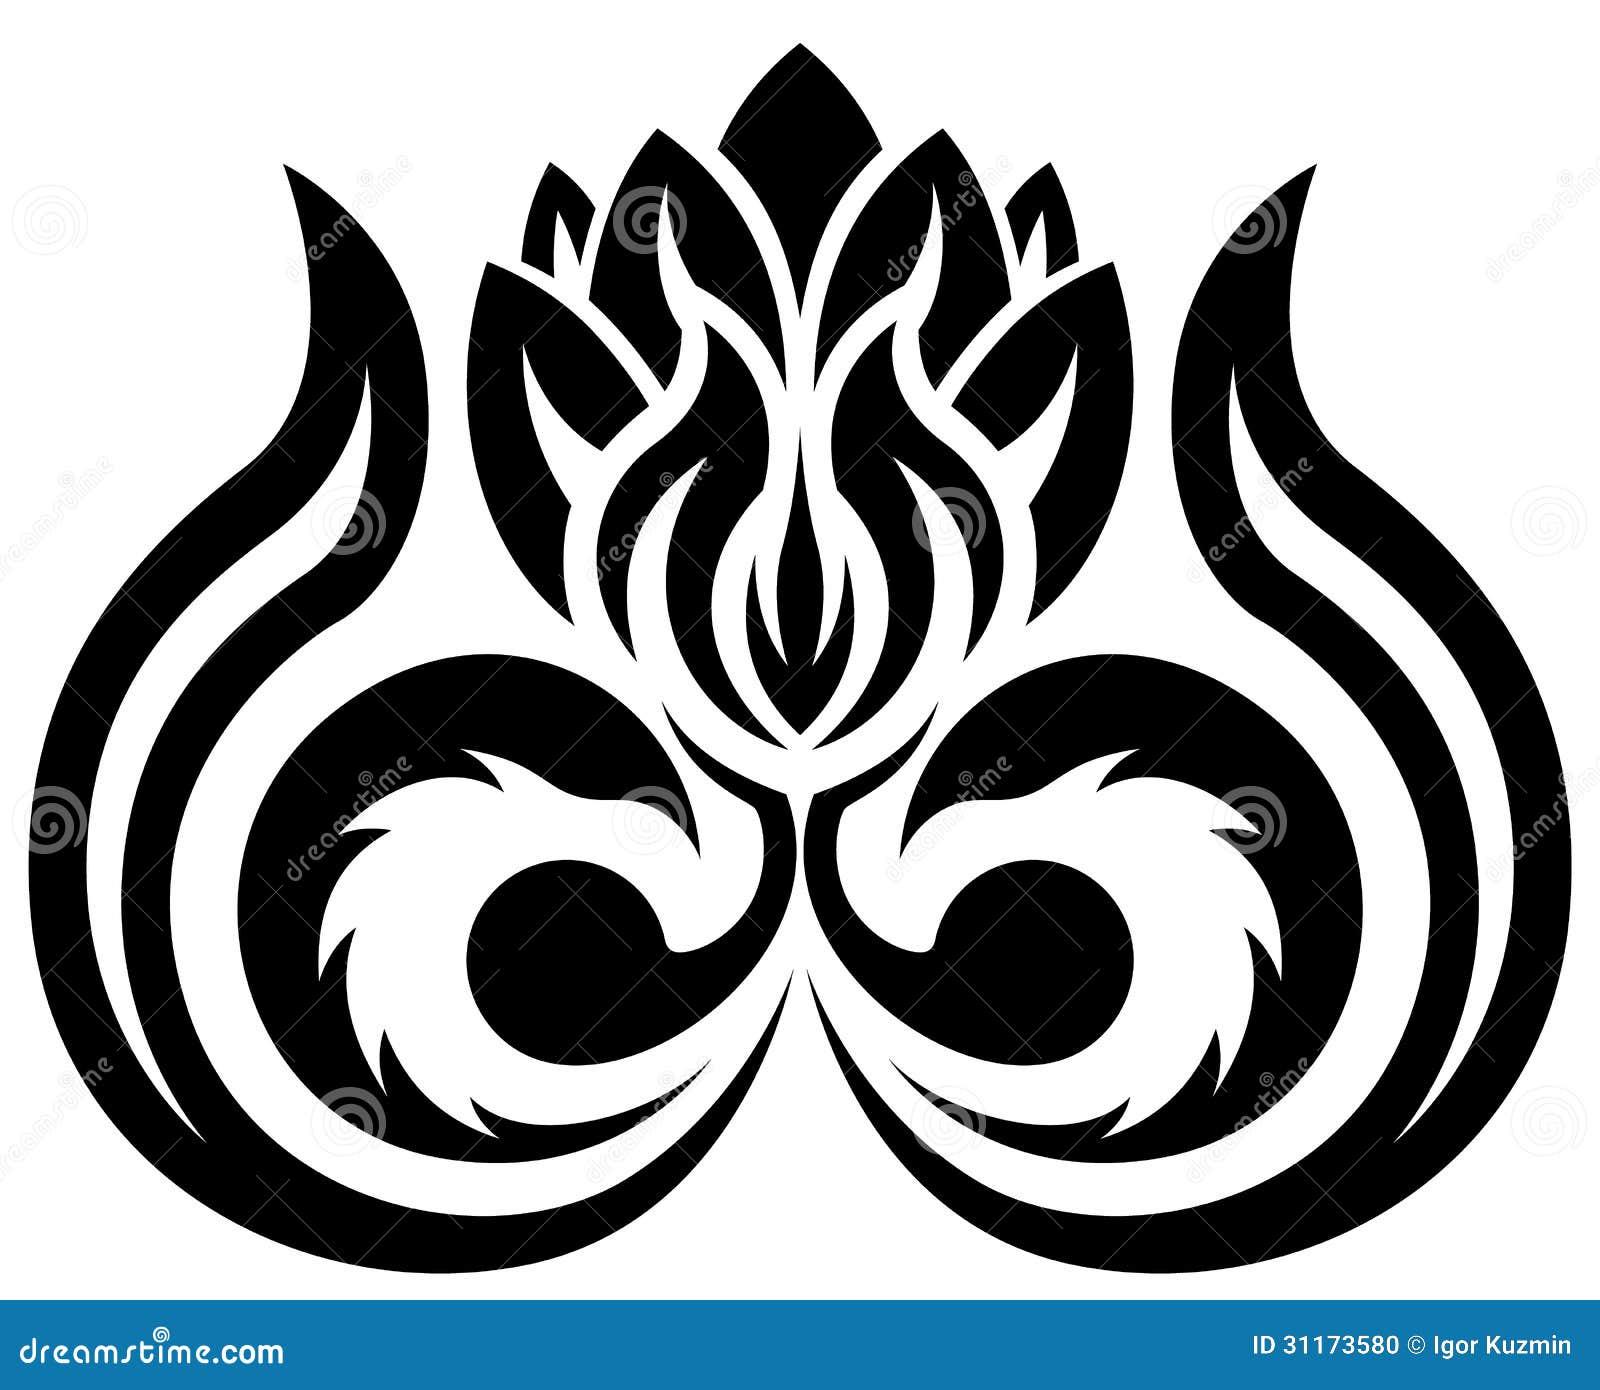 Black Flower Free Vector Download 16 295 Free Vector For: Black Flower Silhouette Stock Vector. Illustration Of